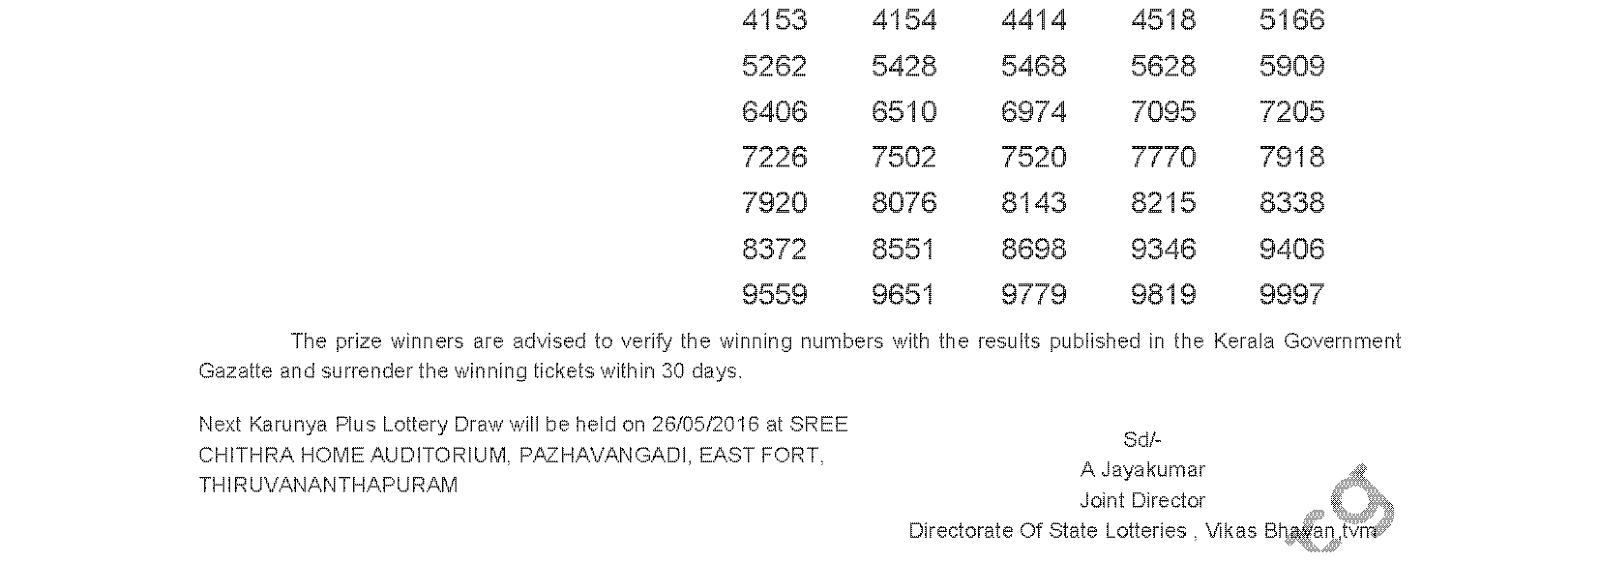 KARUNYA PLUS Lottery KN 110 Result 19-5-2016